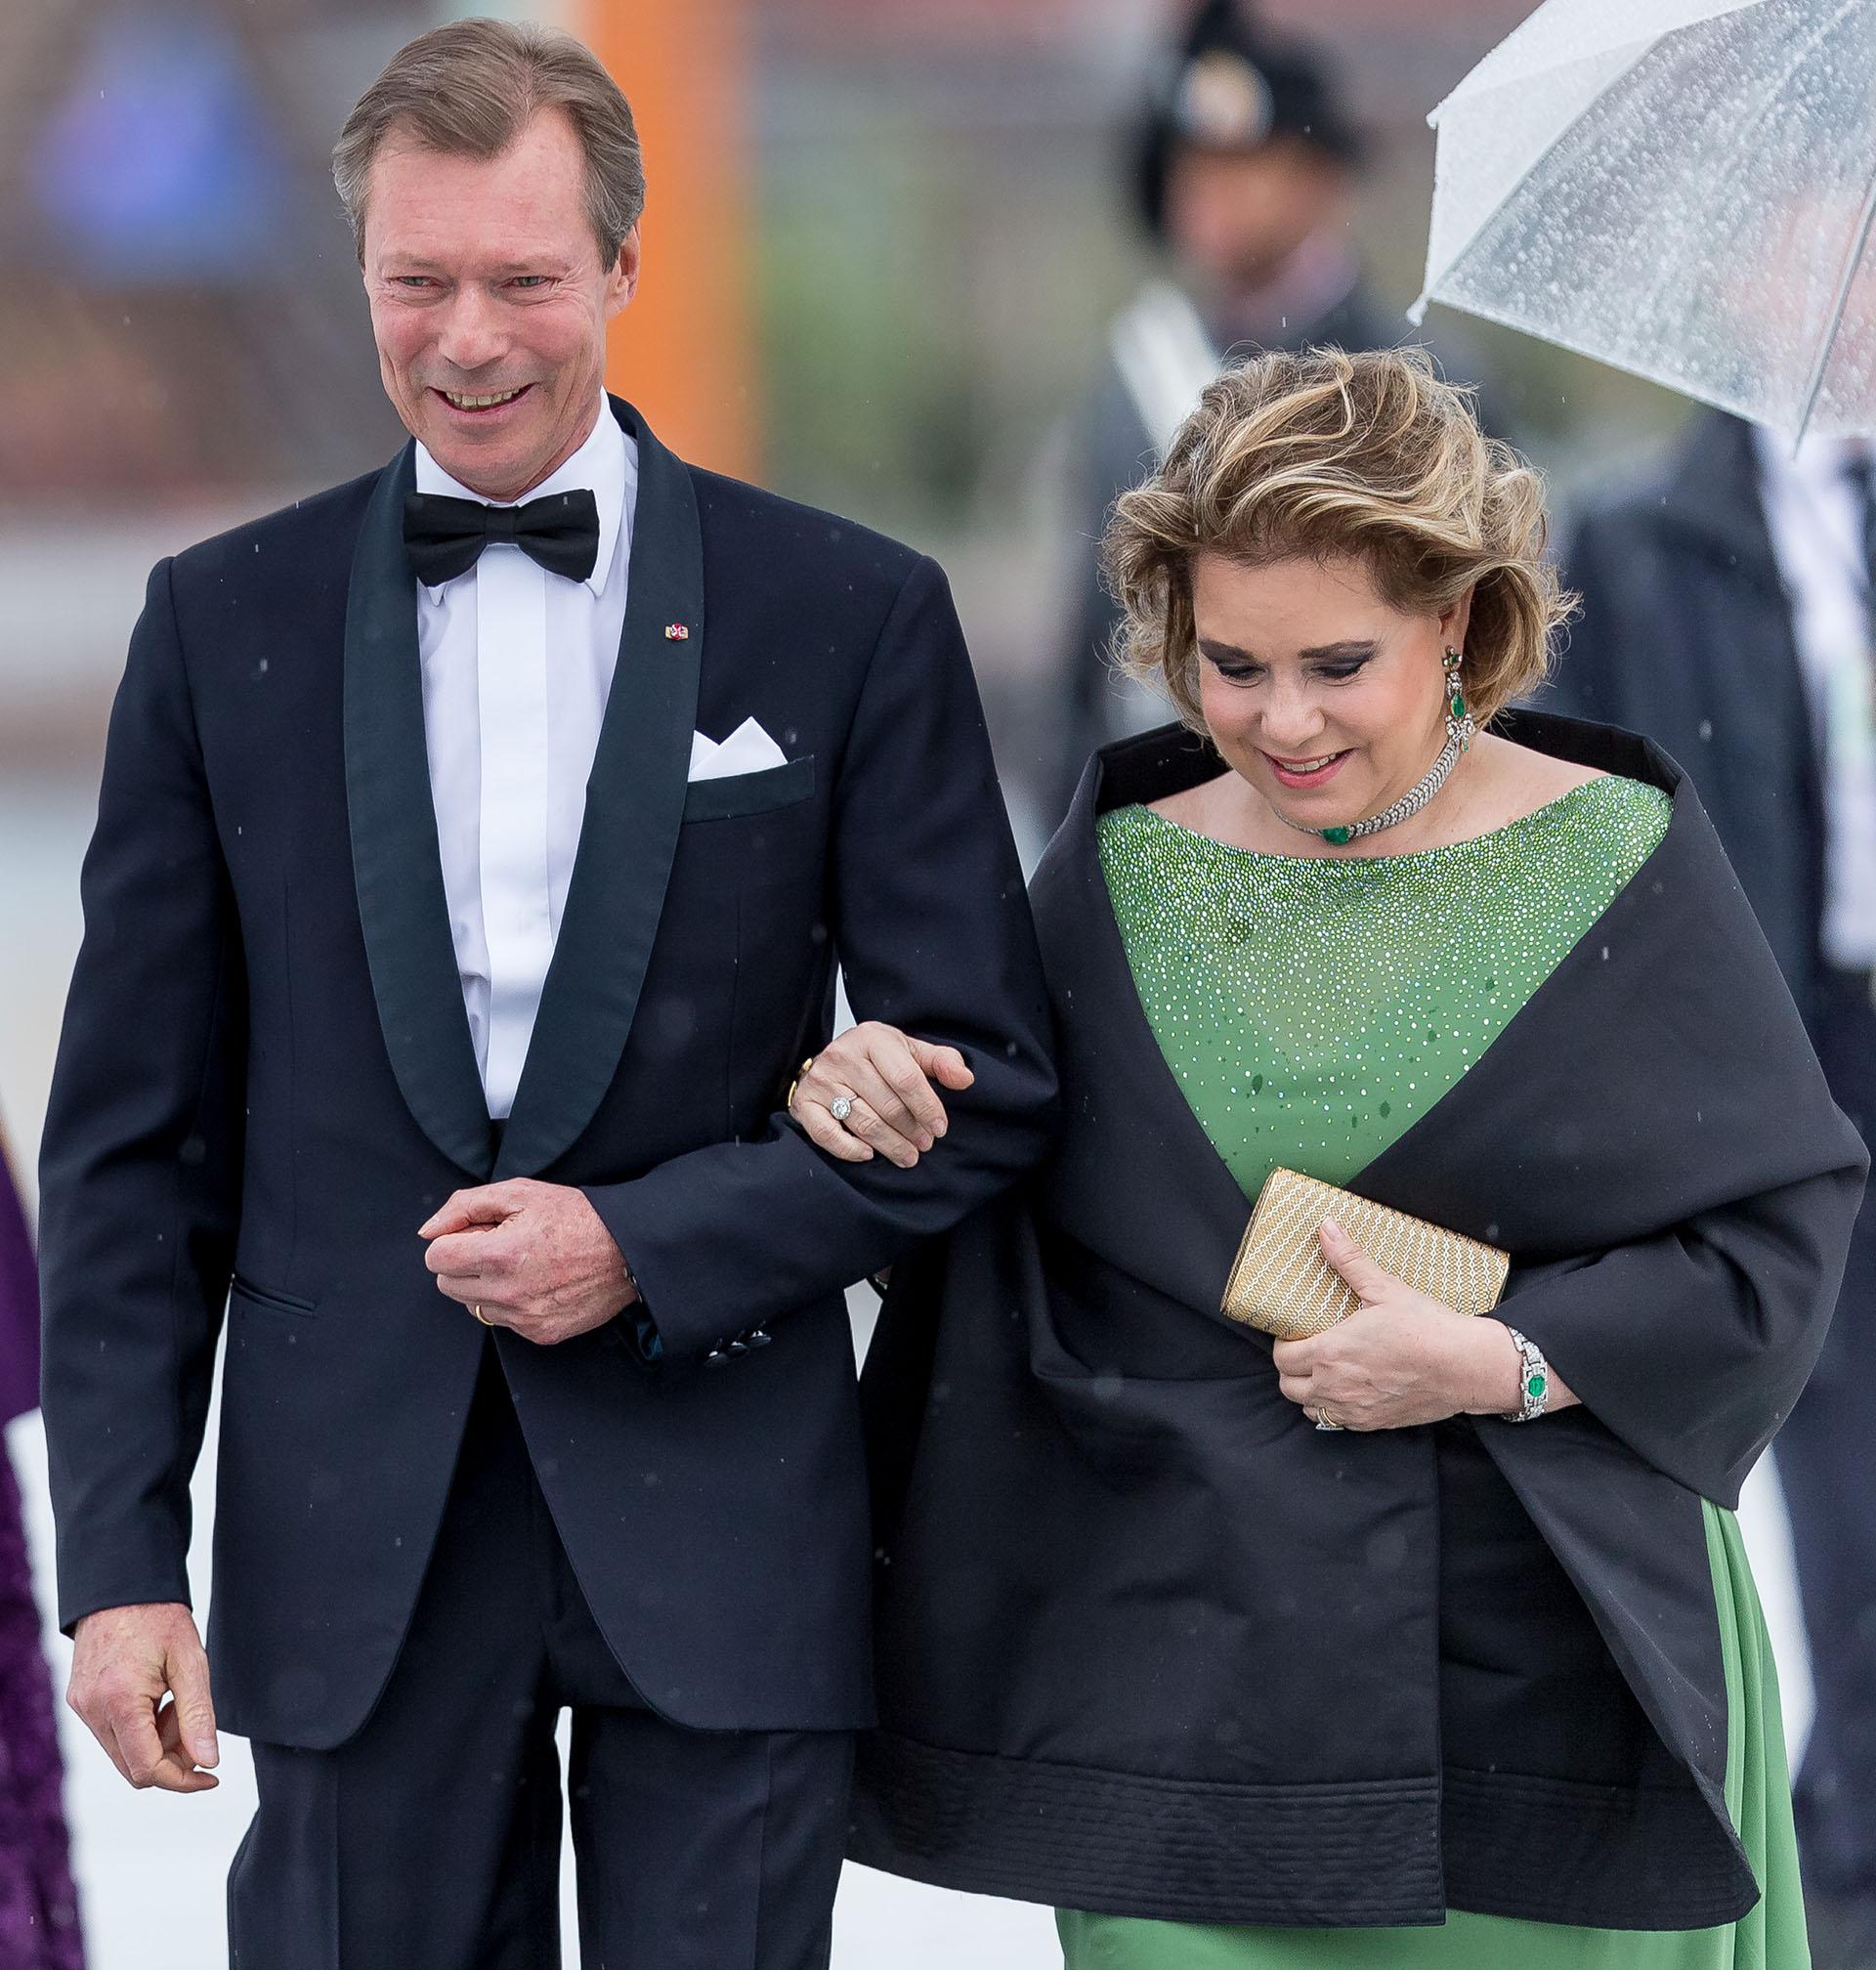 Henri, Gran Duque de Luxemburgo, y la Gran Duquesa Maria Teresa